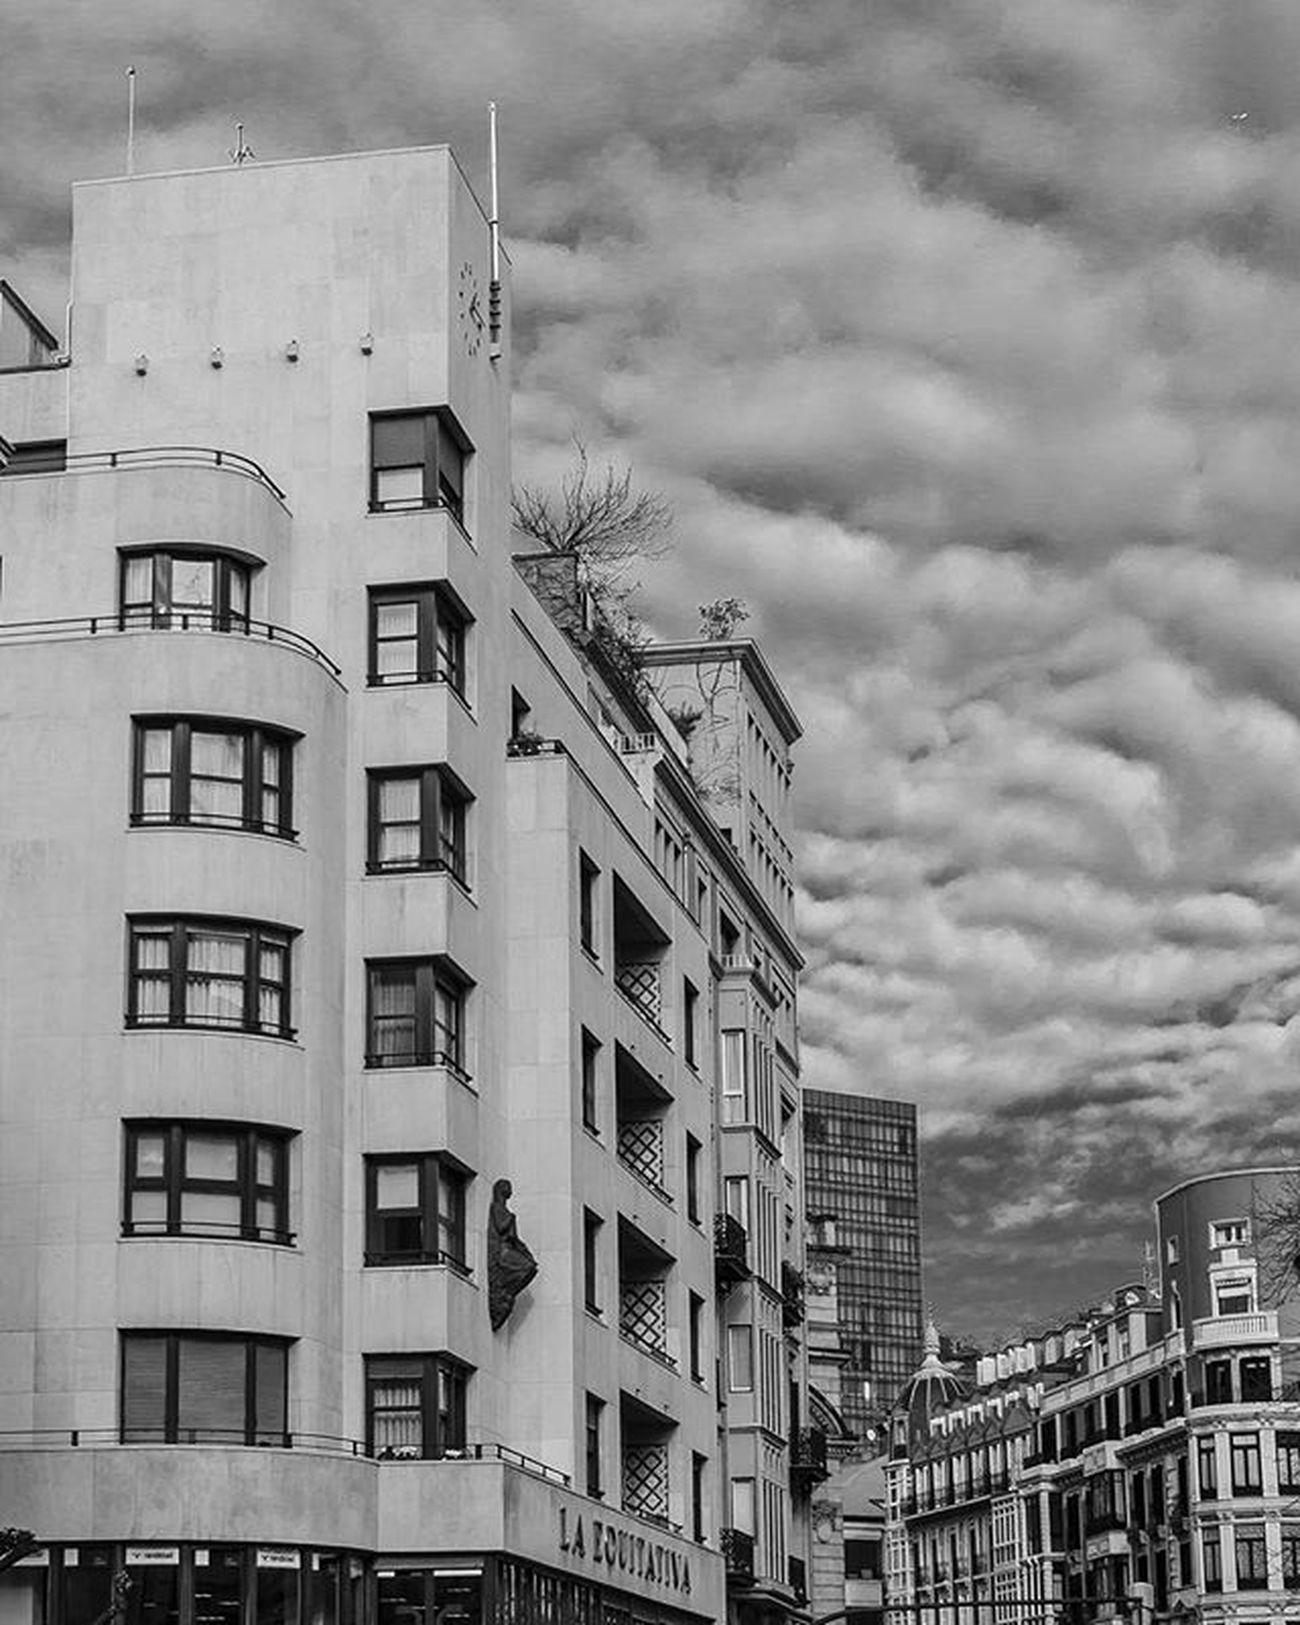 Bilbao Euskadi Streetphotography Verybilbao Bilbosoul Ilovebilbao Total_euskadi Estaes_paisvasco Loves_euskadi Bilbaoclick Estaes_de_todo Estaes_euskadi Turismo_euskadi Euskorincones Total_city Total_night Ok_spain Thebestoftheday Ig_sanat Igersbilbao Igersbizkaia Igerseuskadi Igersspain Igerseurope Architecture bilbosoulchallenge ReflectionGram lagildadelnorte bnw_greatshots bnwsplash_paisvasco